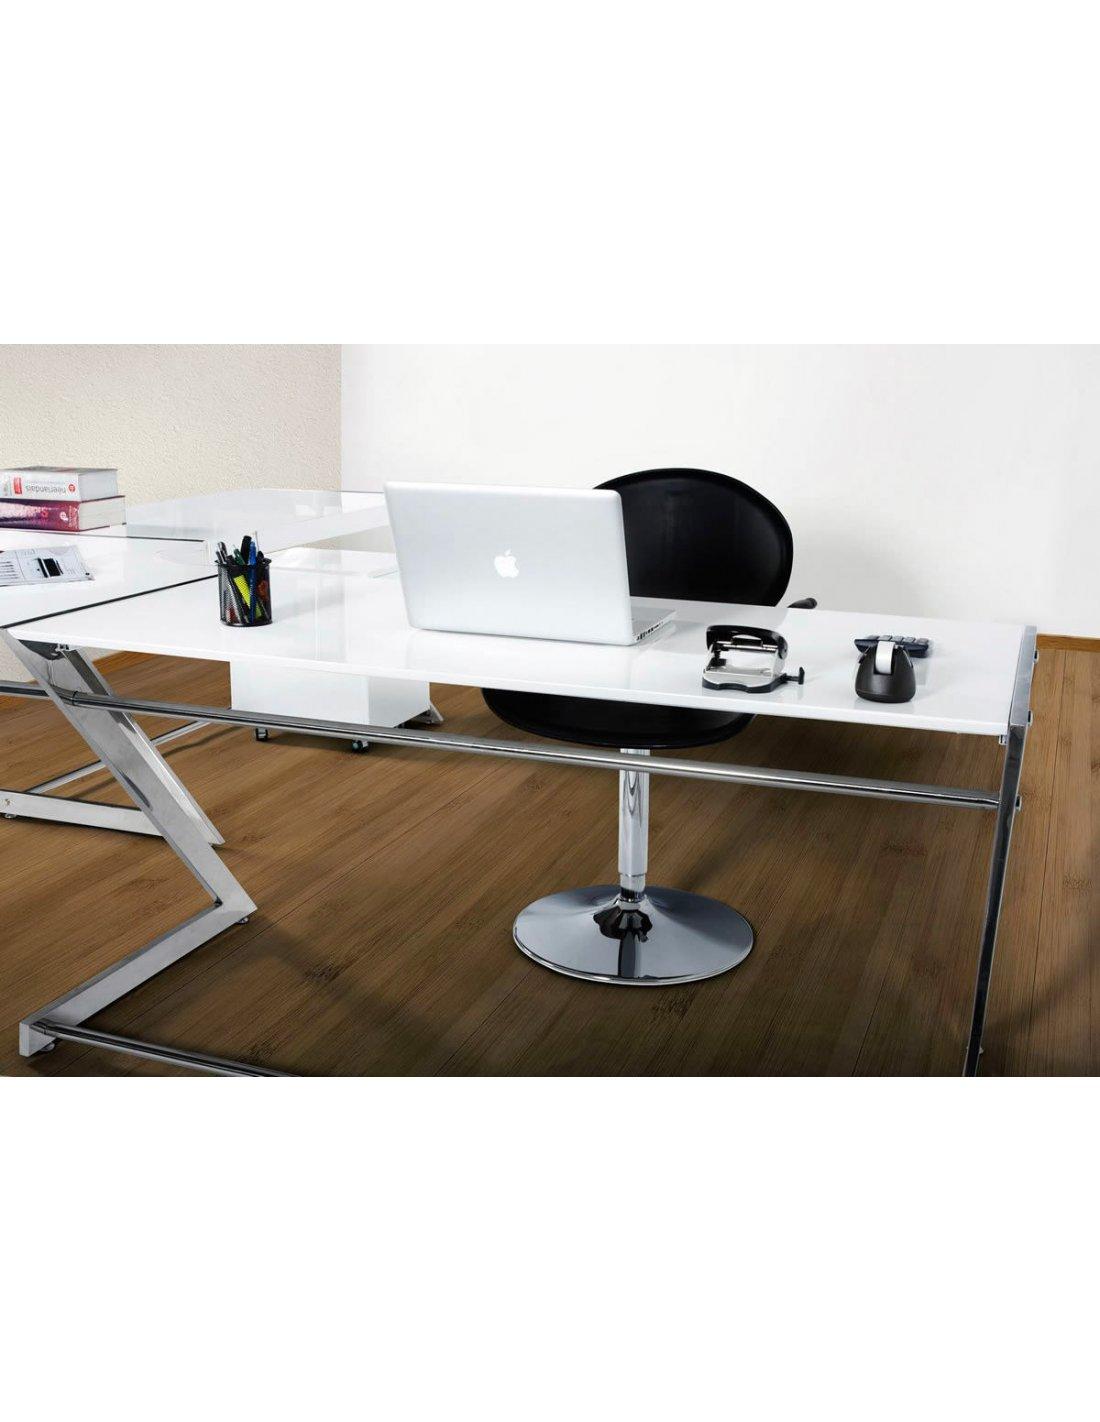 bureau d angle arrondi modern kokoon design 1 chez recoll. Black Bedroom Furniture Sets. Home Design Ideas